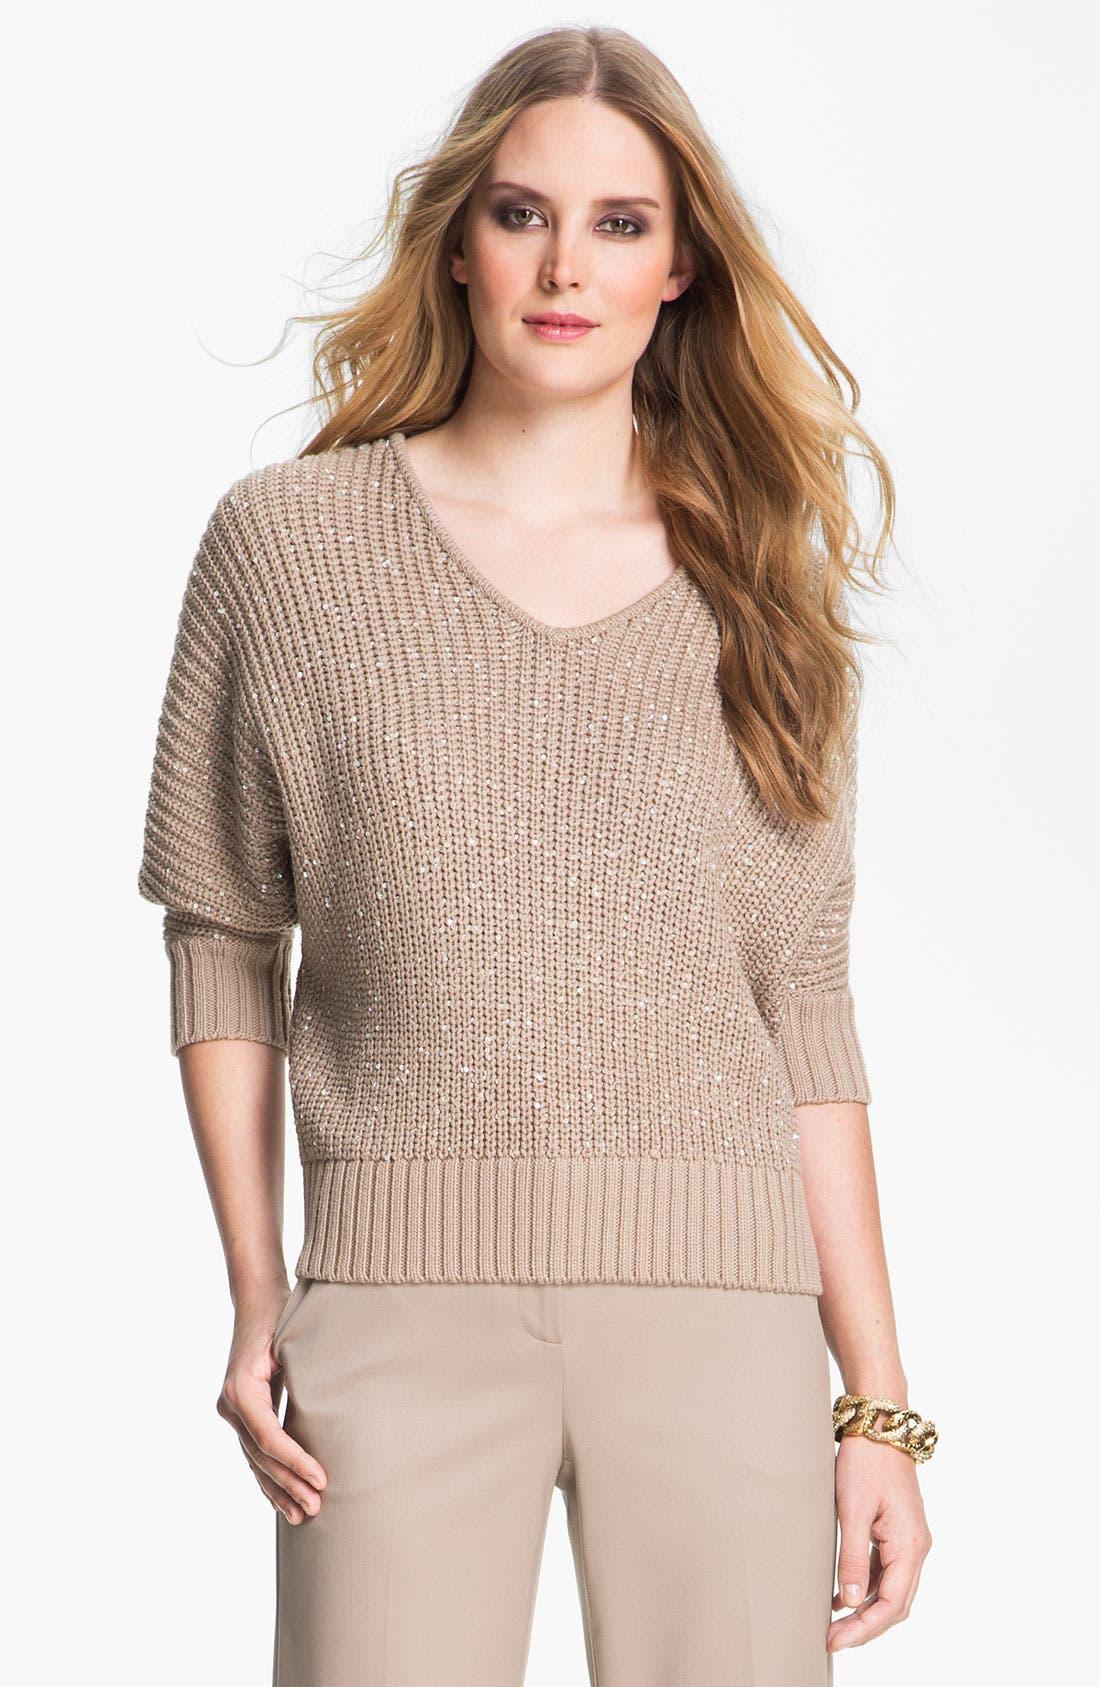 Main Image - St. John Yellow Label Sequin Knit Sweater